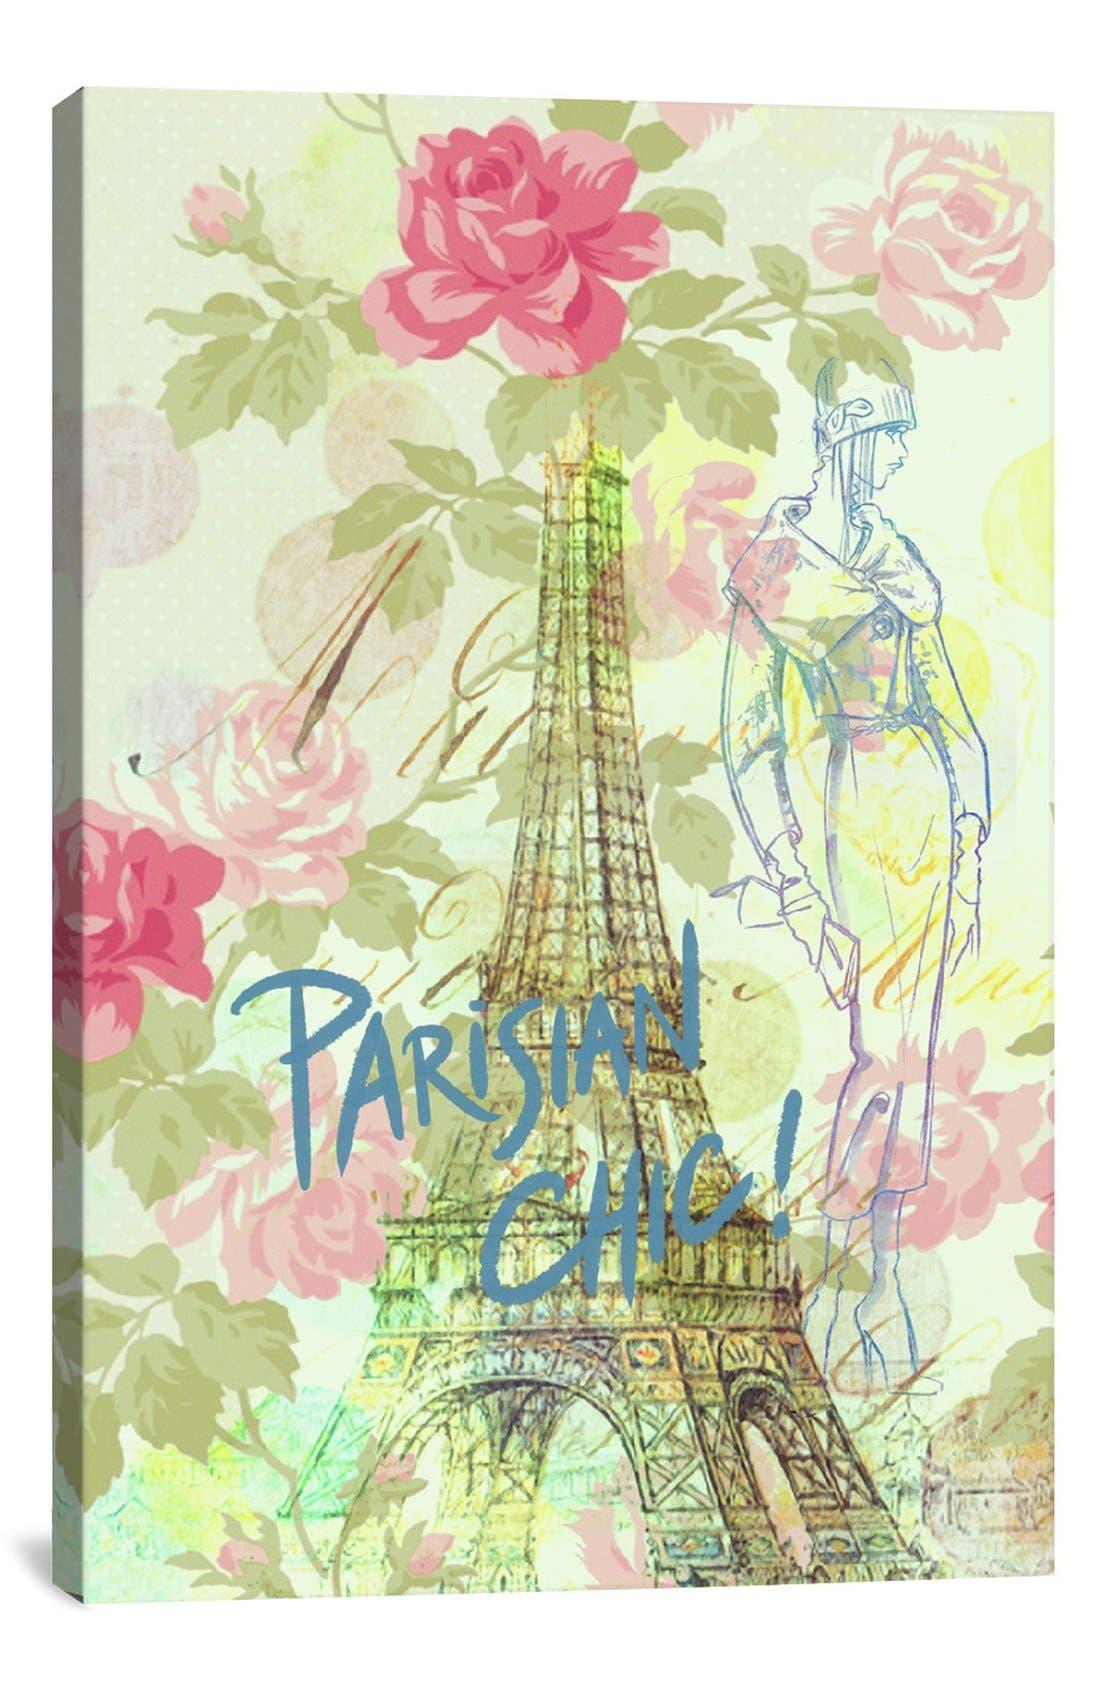 Alternate Image 1 Selected - iCanvas 'Parisian Chic - Guy Jinn' Giclée Print Canvas Art